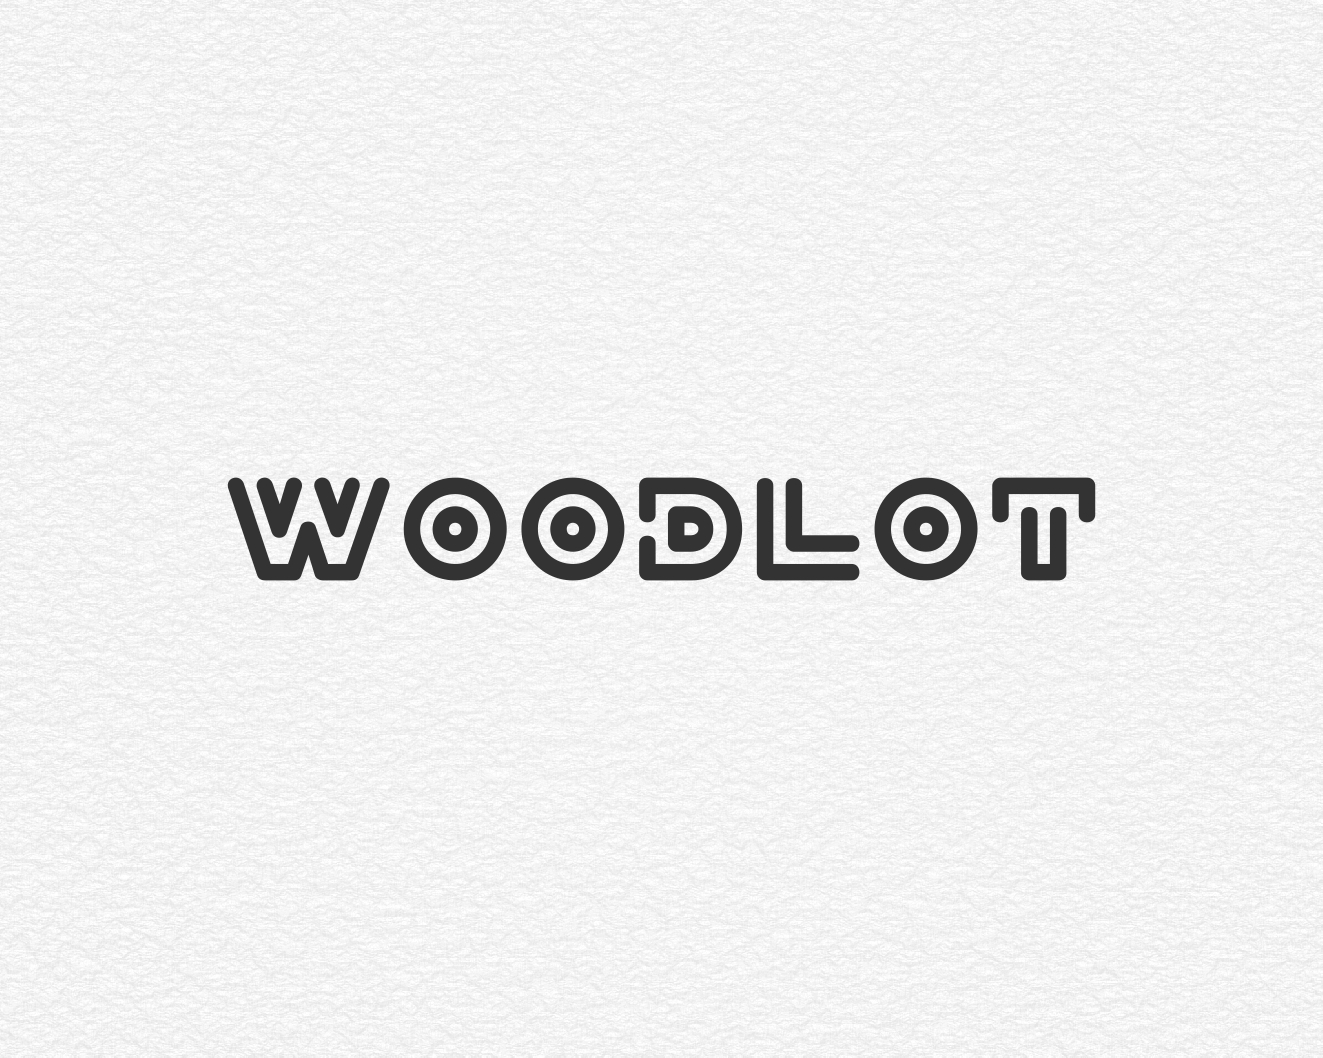 Logo Design by Rares.Andrei - Entry No. 64 in the Logo Design Contest Fun Logo Design for woodlot.